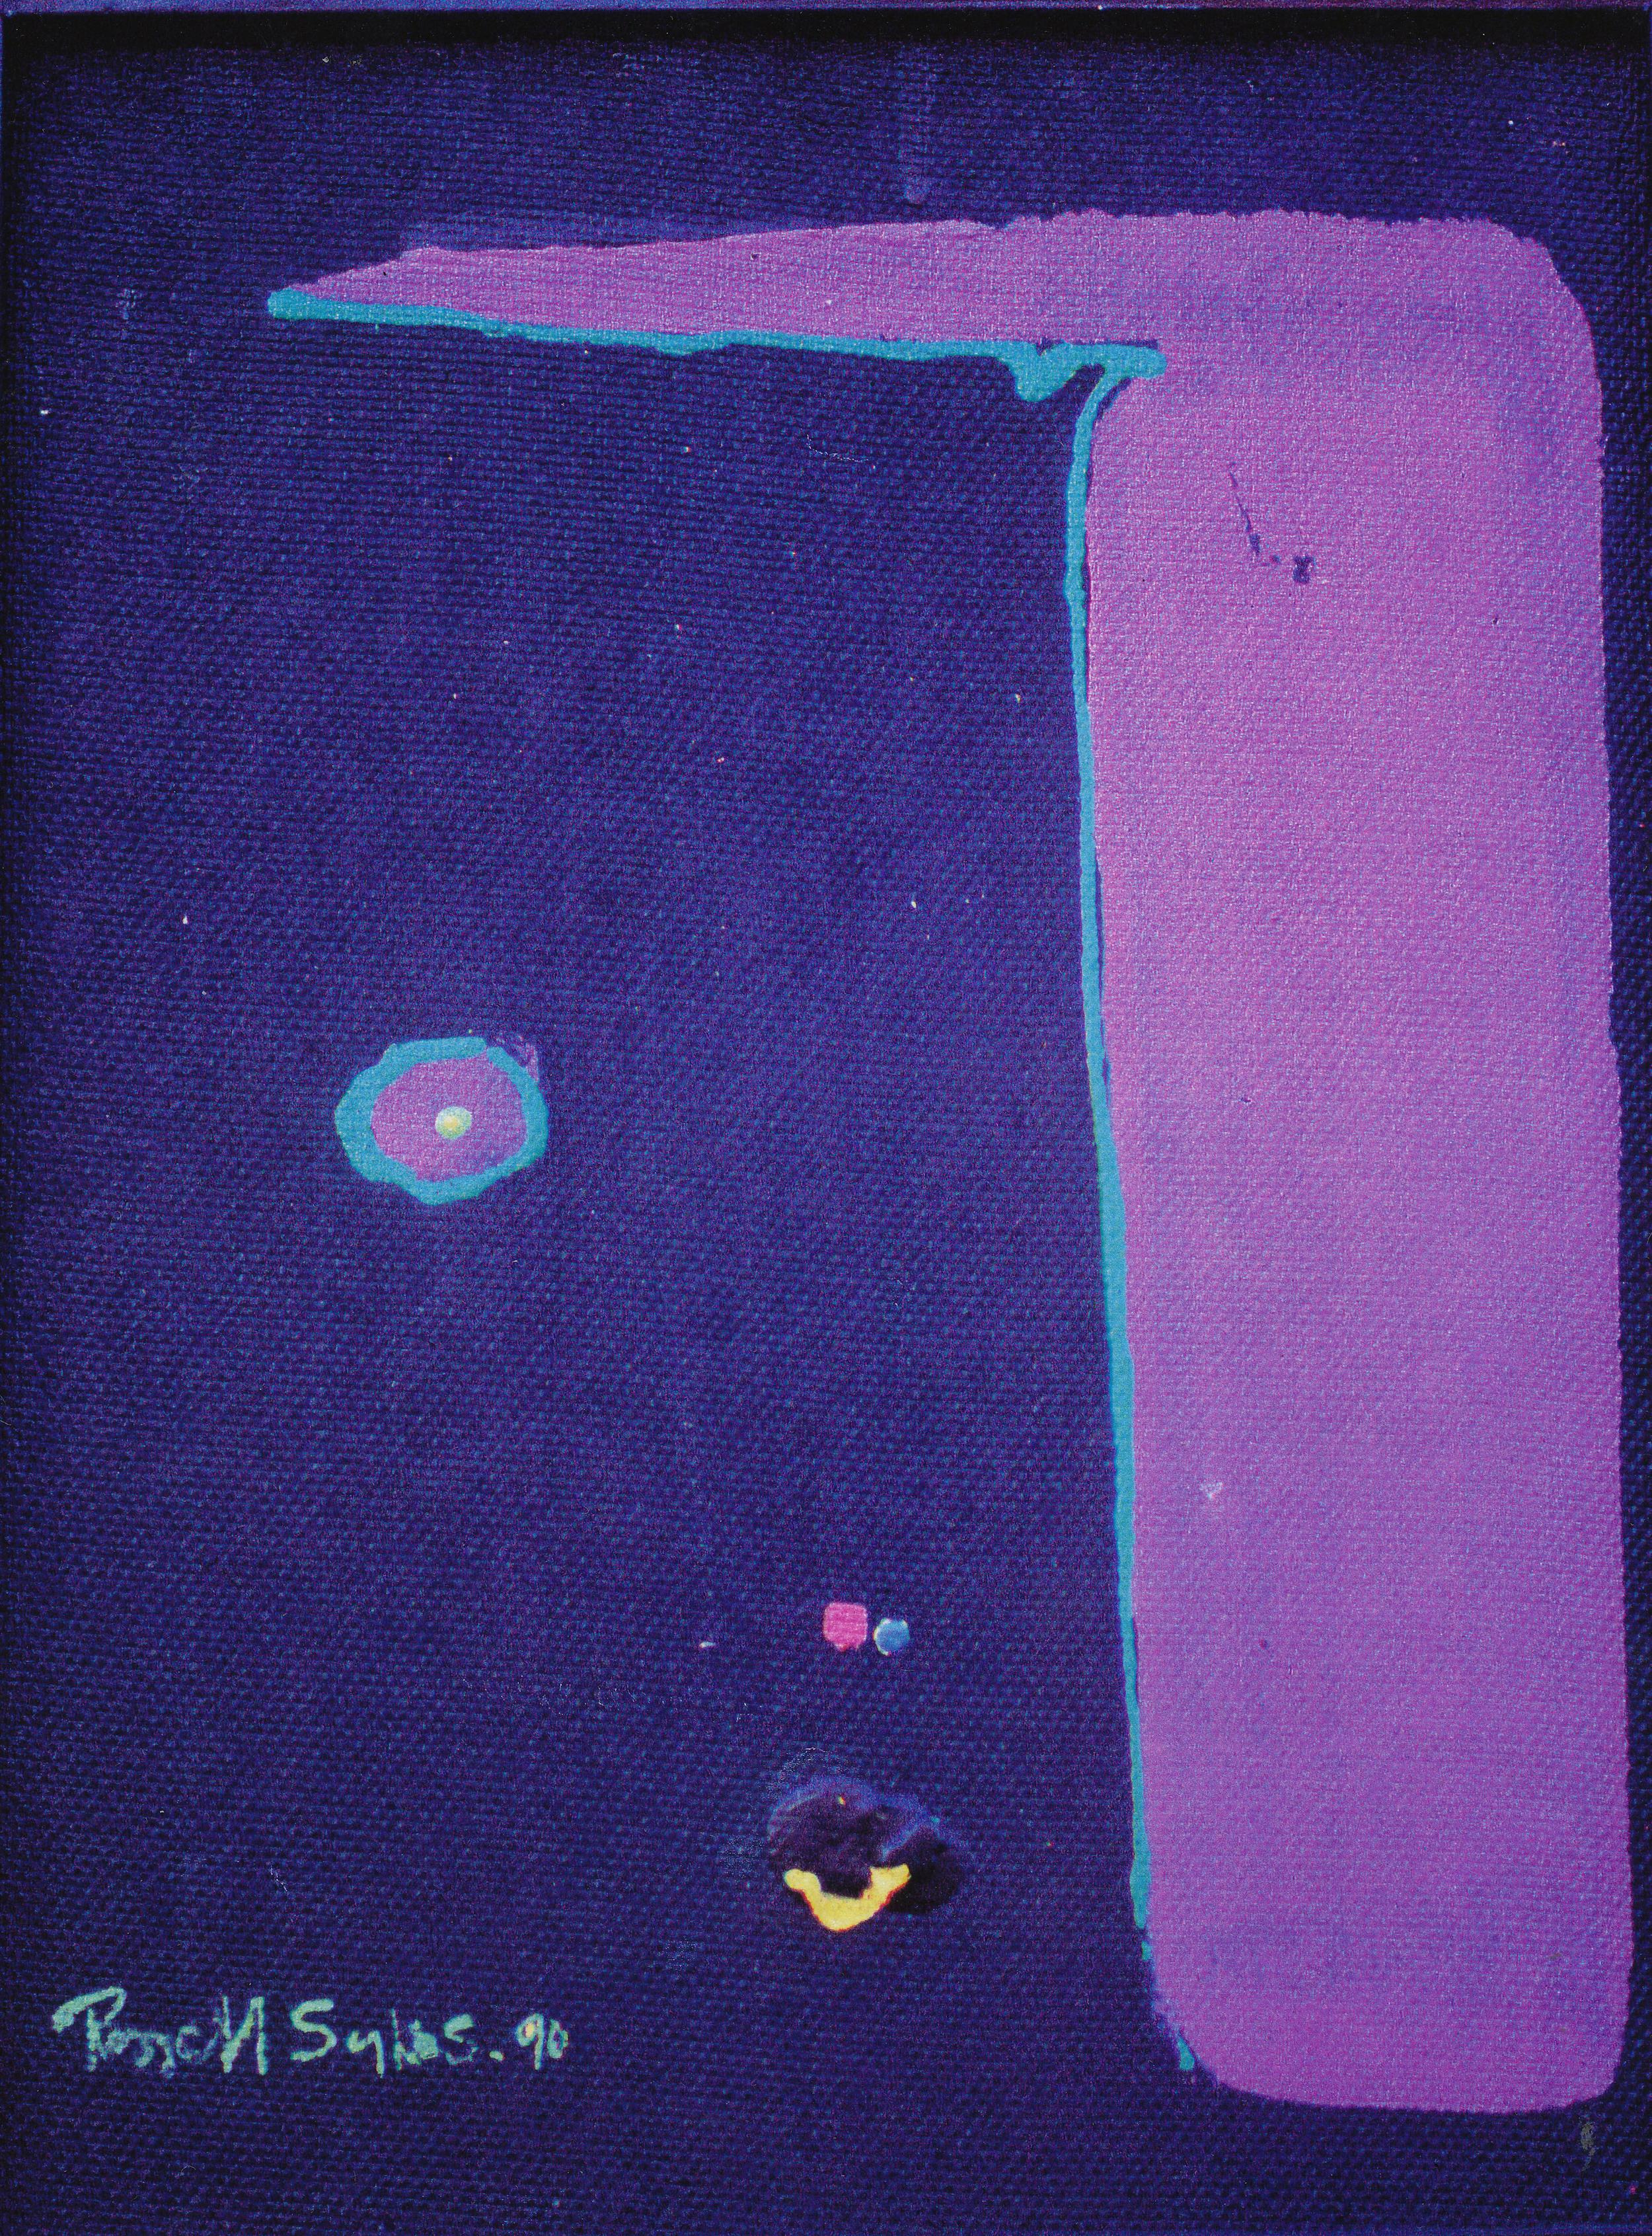 Toe Jam 1990